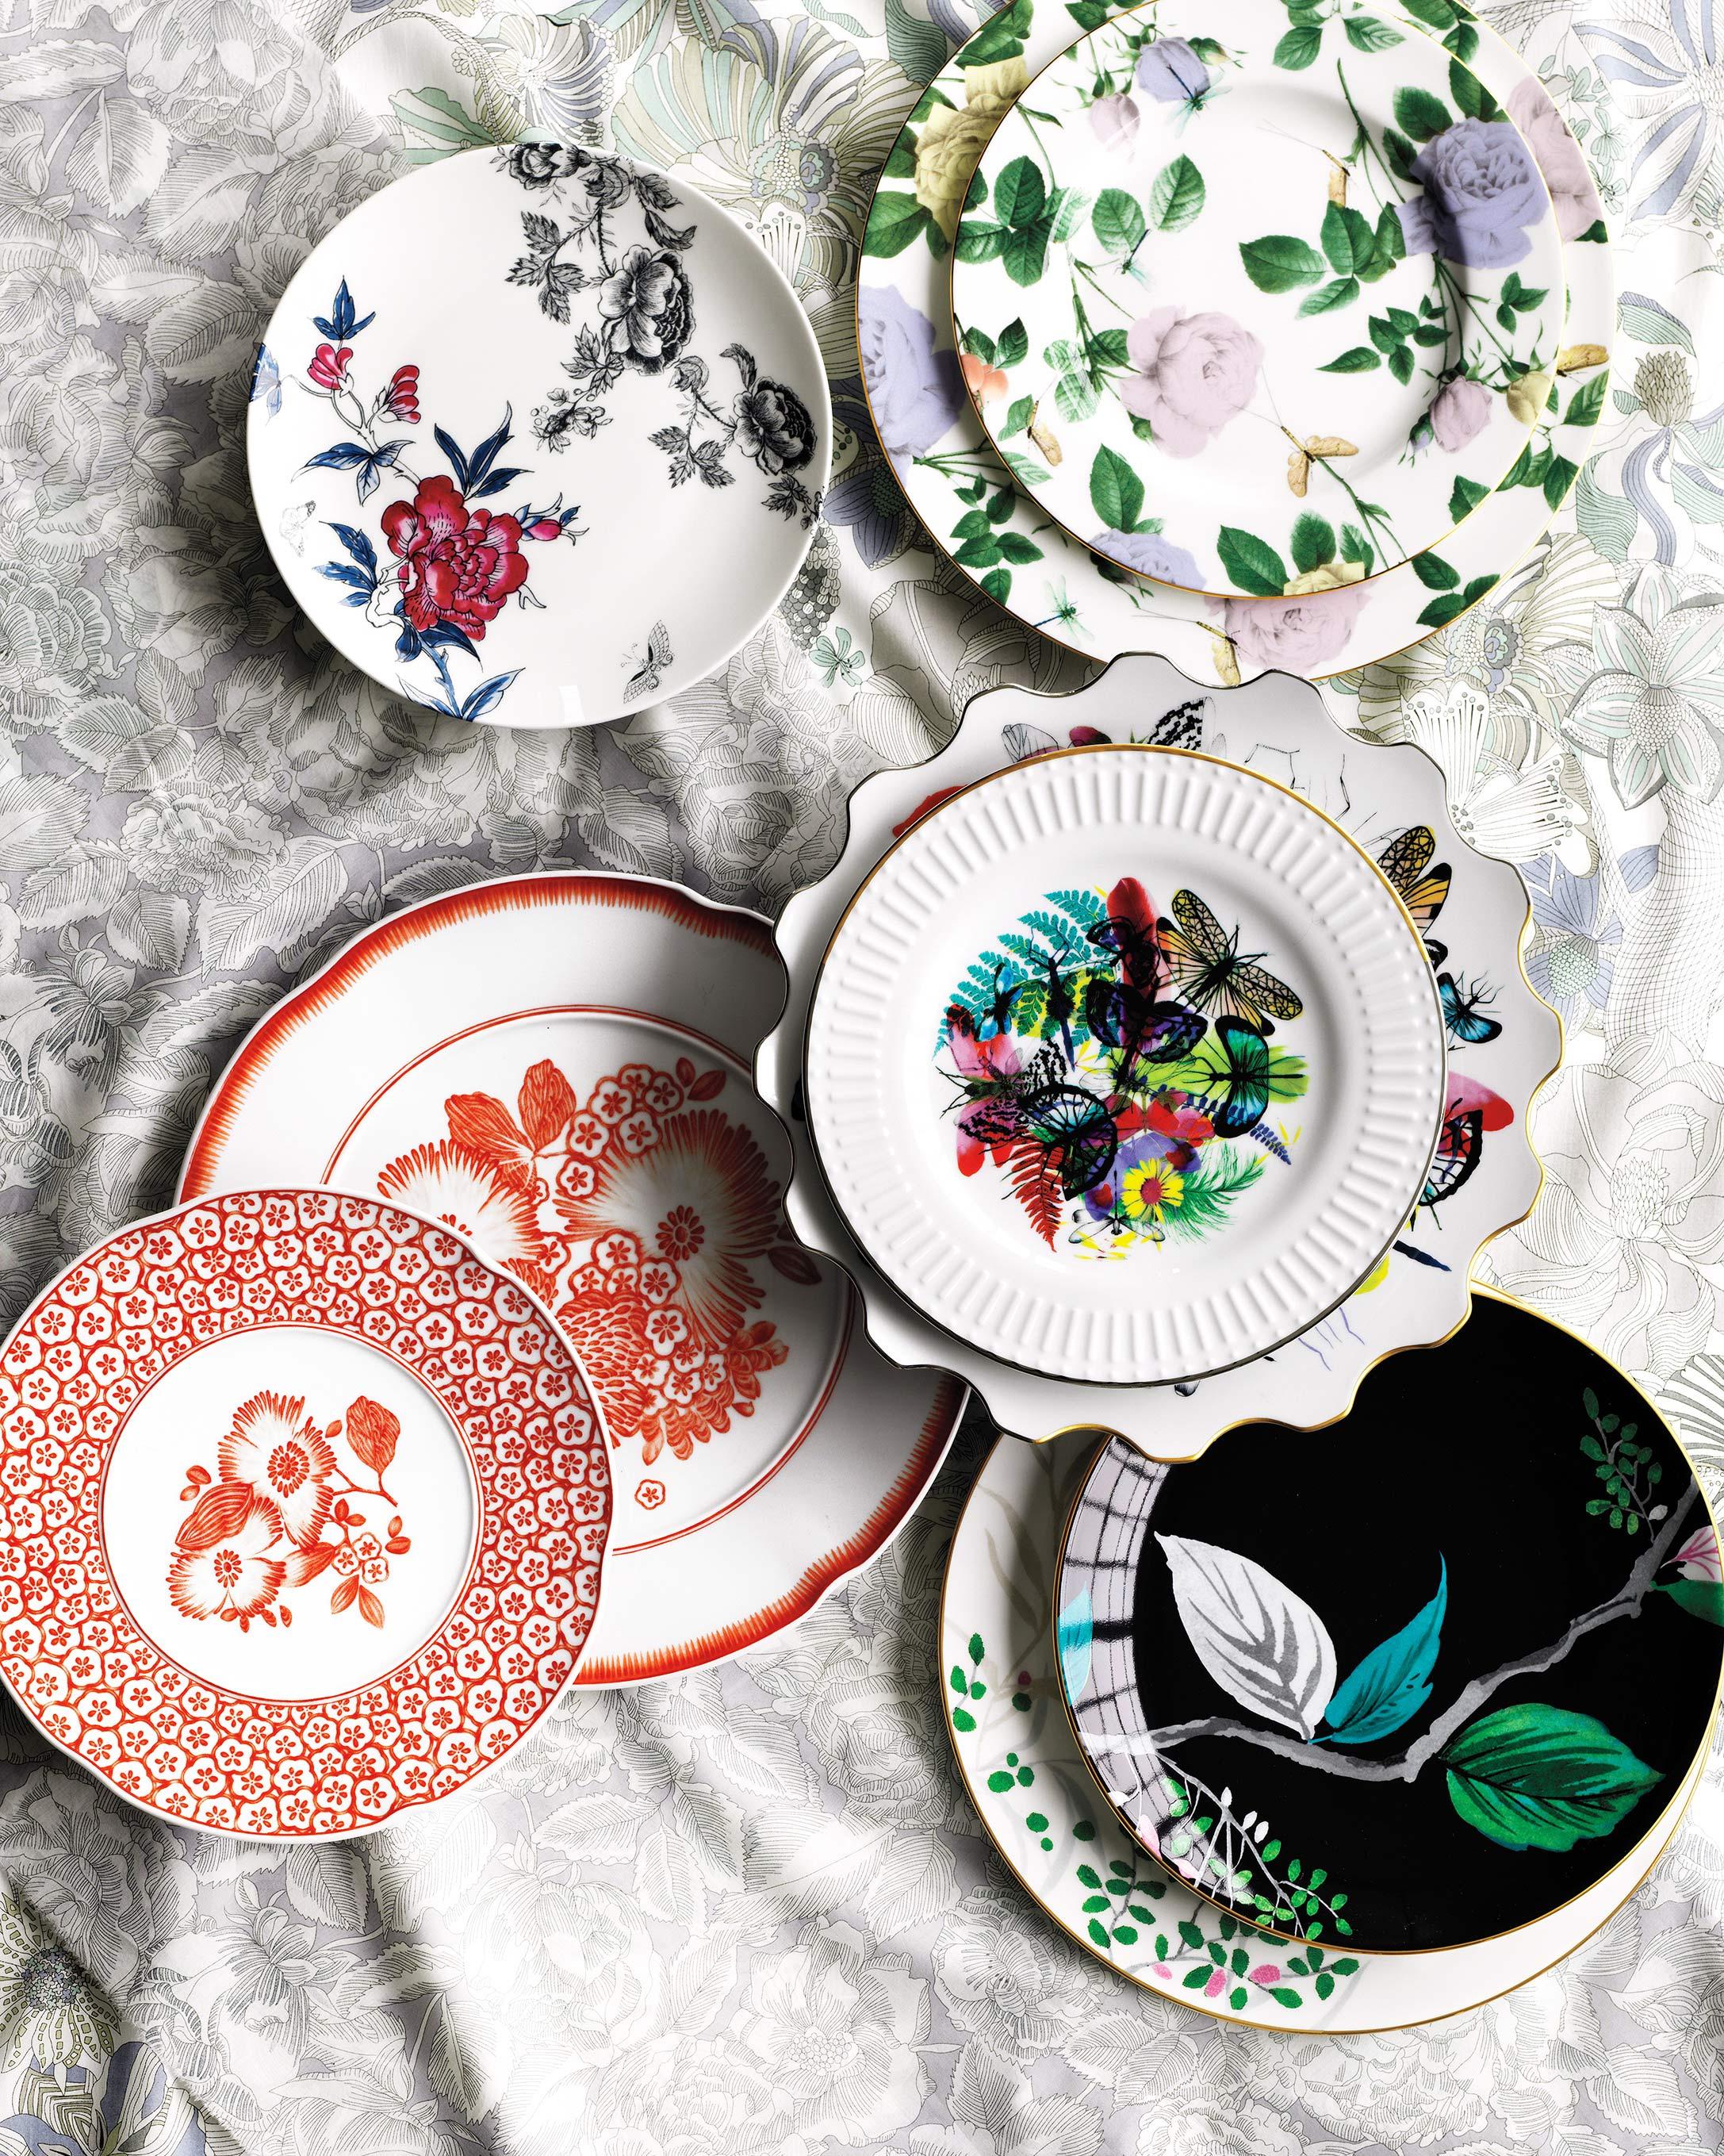 mfloral-china-decorative-plates-v2-crop-03-d112735.jpg